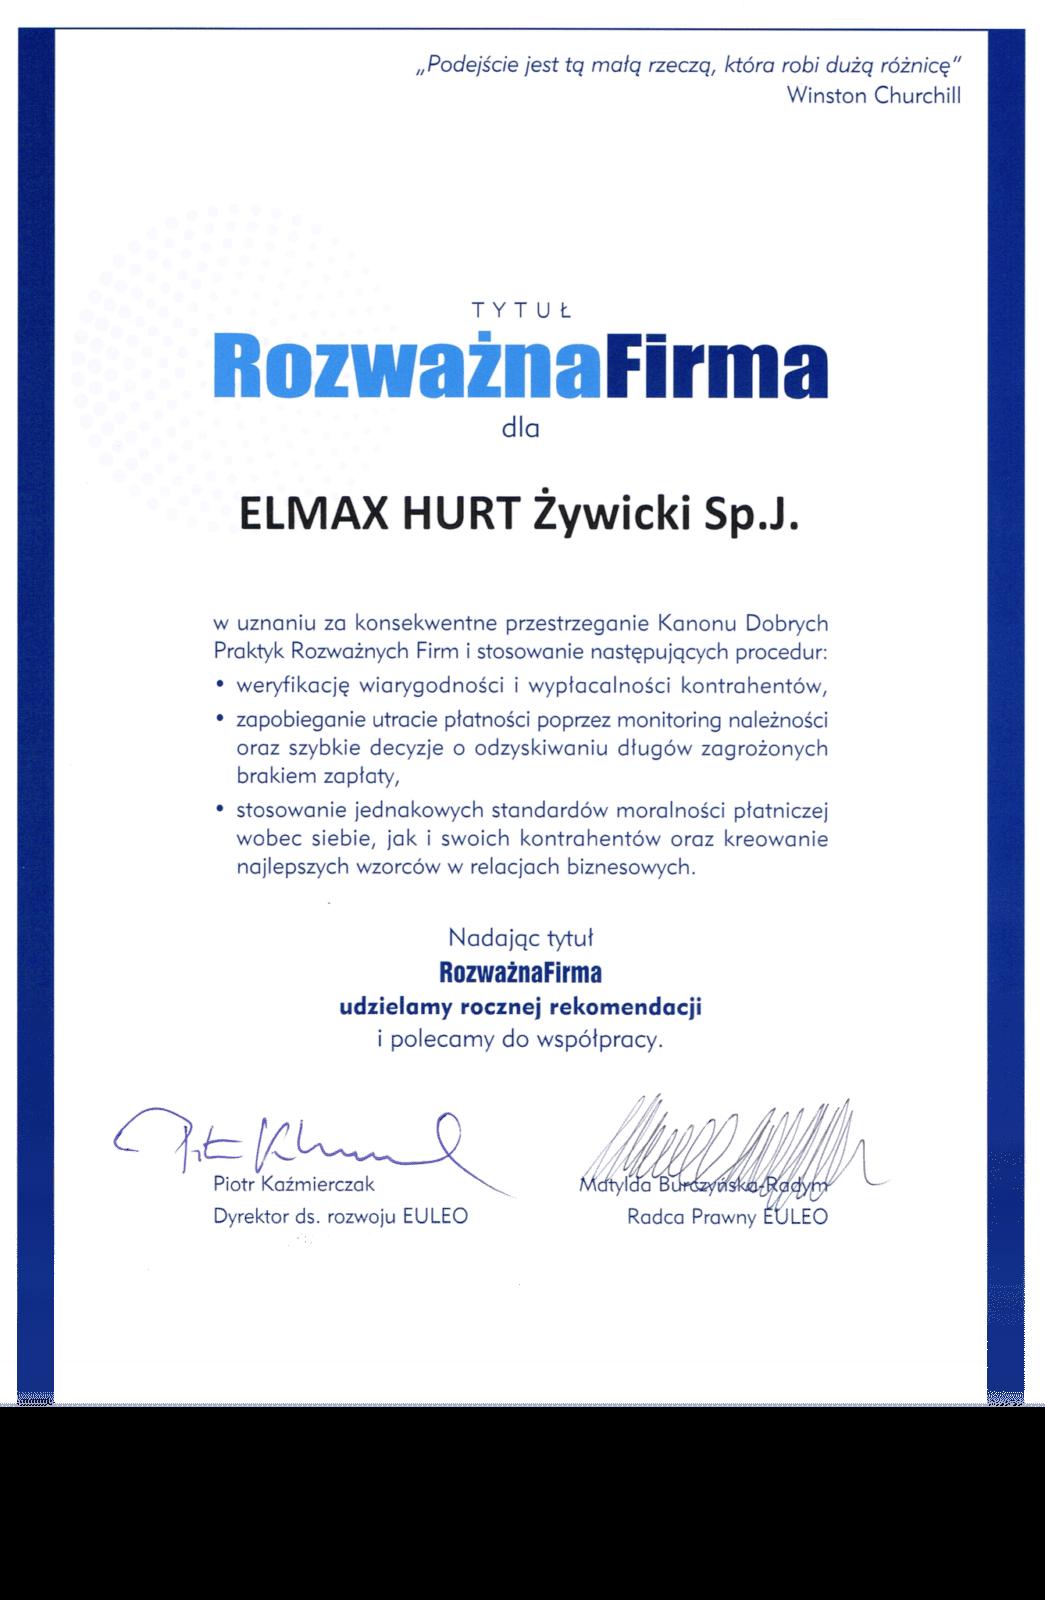 Certyfikat Rozważna Firma ELMAX